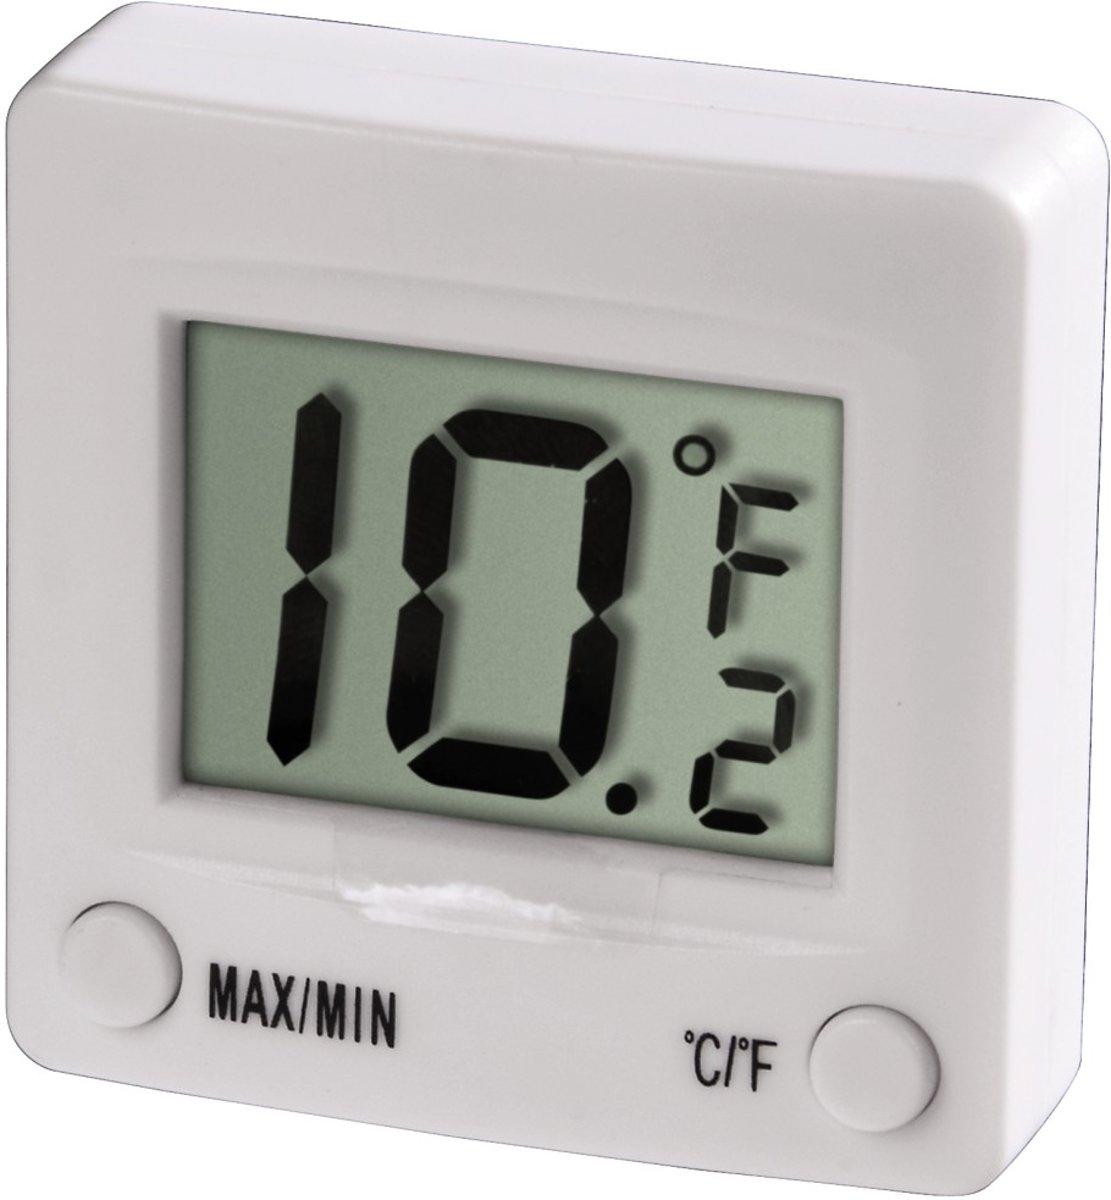 Xavax Green Eco - Digitale koelkast thermometer kopen